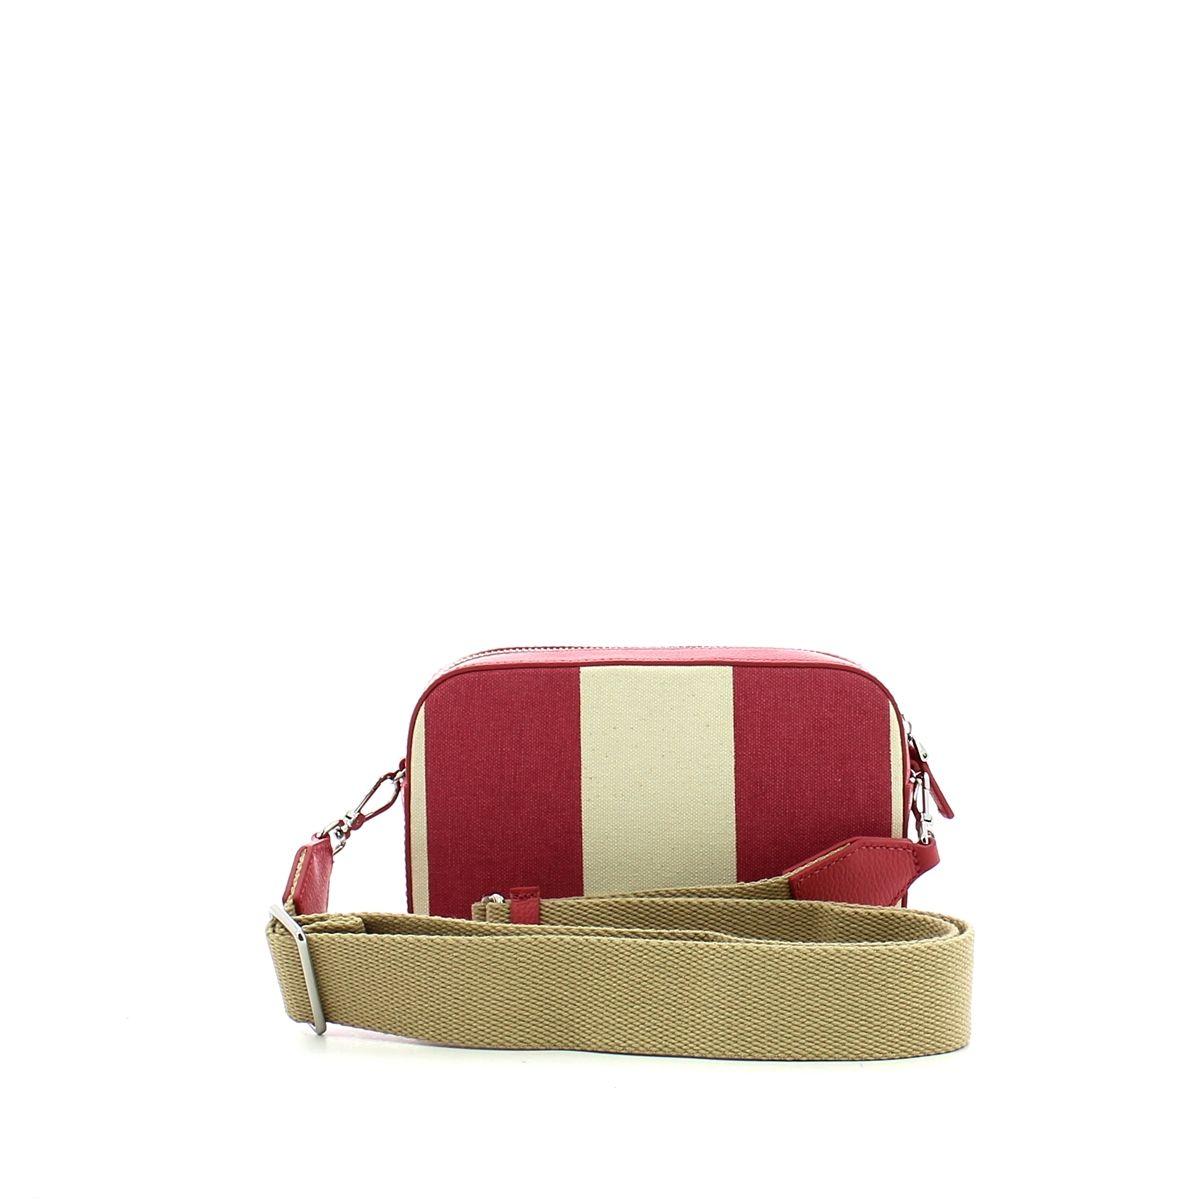 Tebe Crossbody Bag Stripes Canvas Coccinelle BOUGANV/BOUGANV